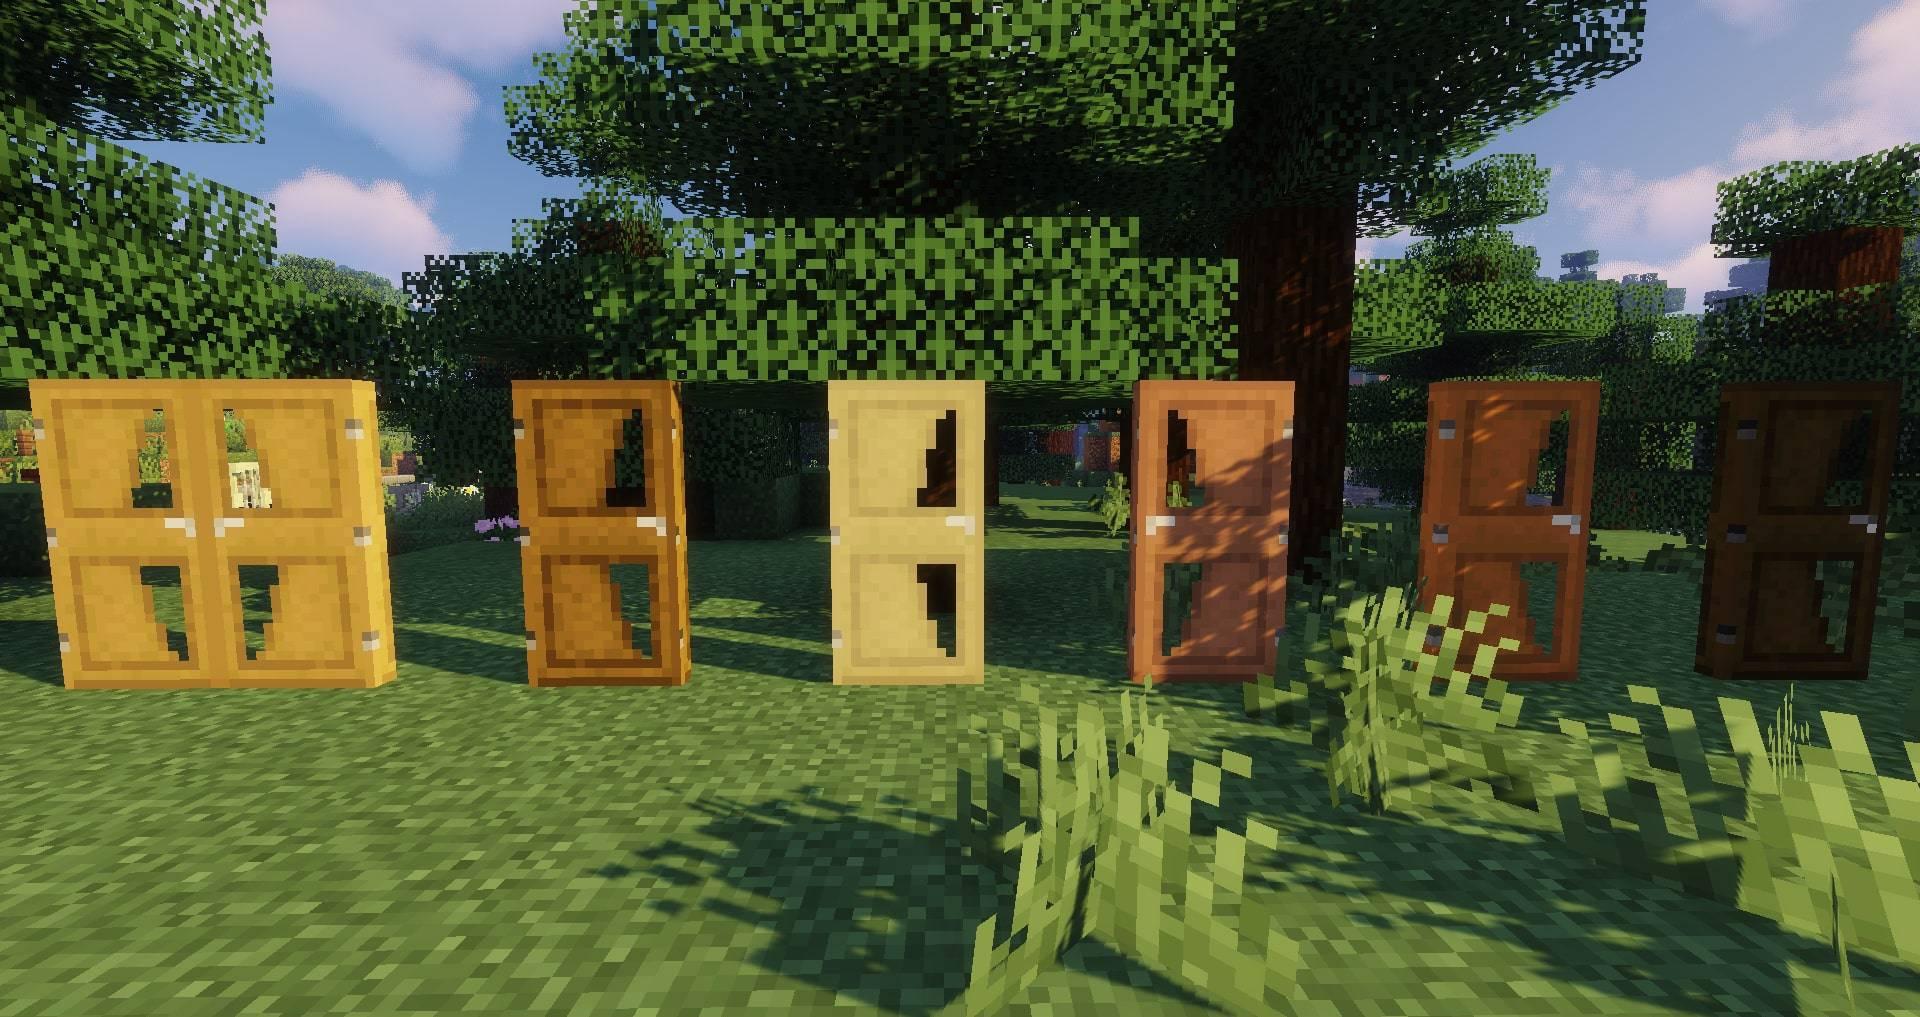 Macaw_s Doors mod for minecraft 24